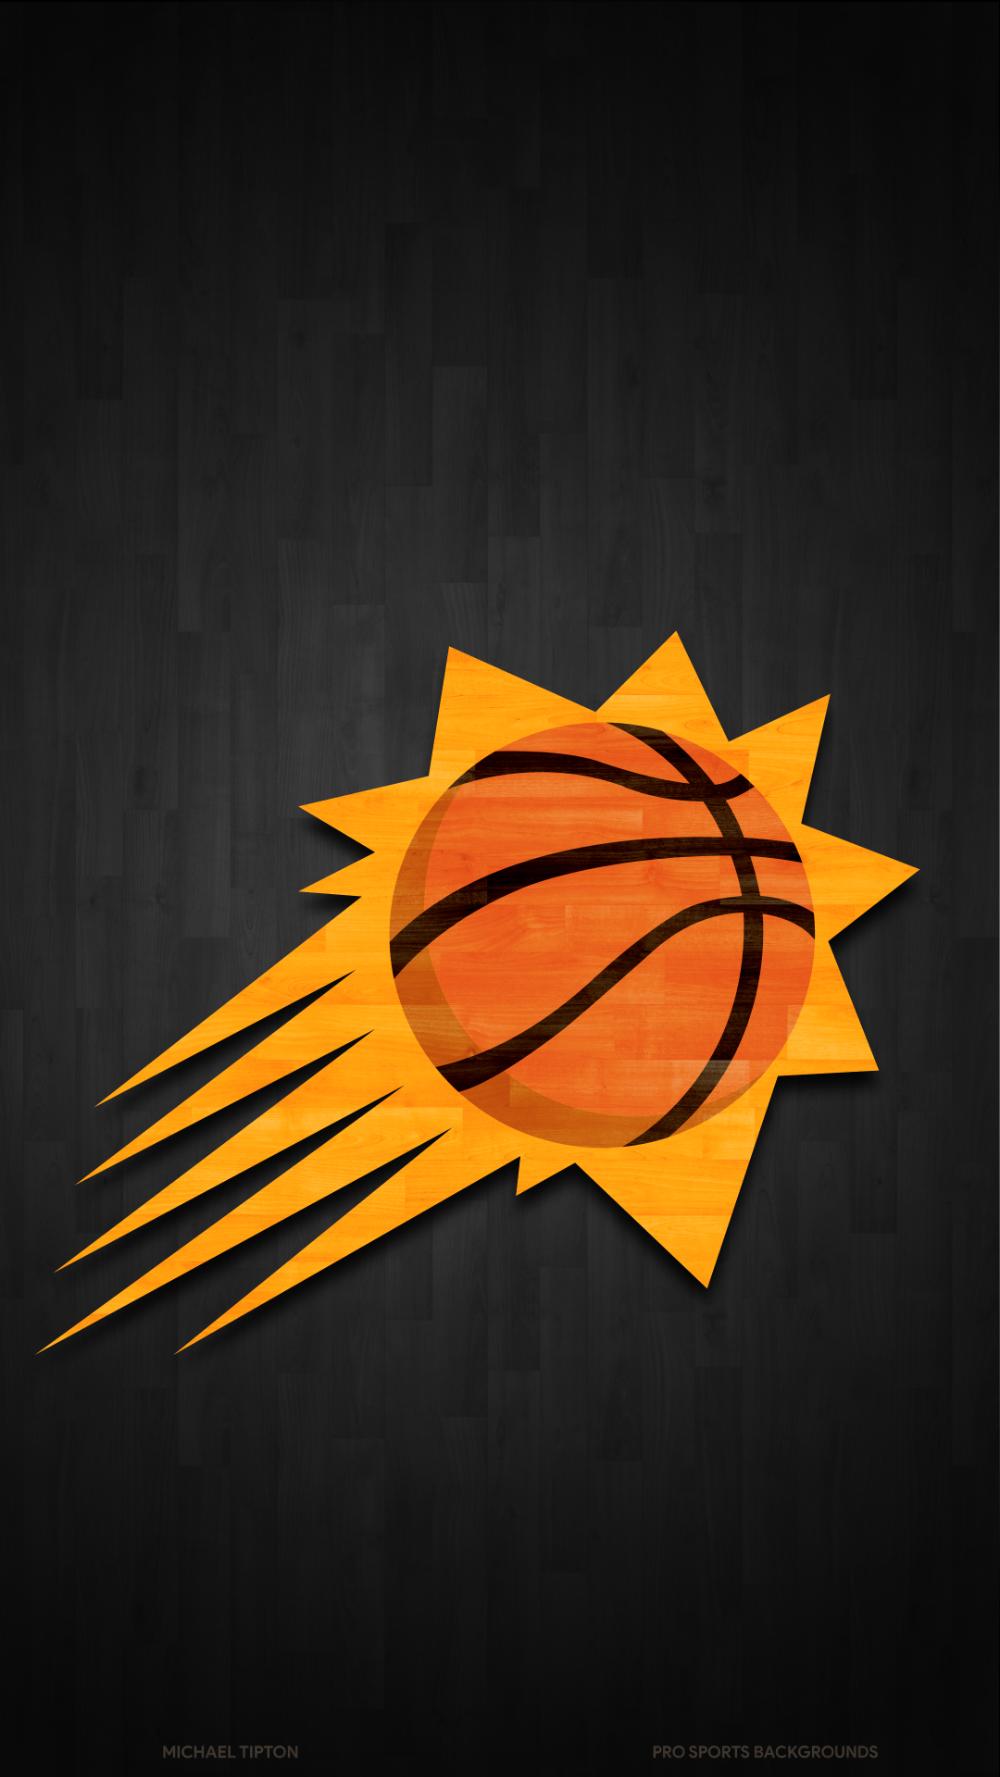 Phoenix Suns Wallpapers Pro Sports Backgrounds Phoenix suns 1000x1777